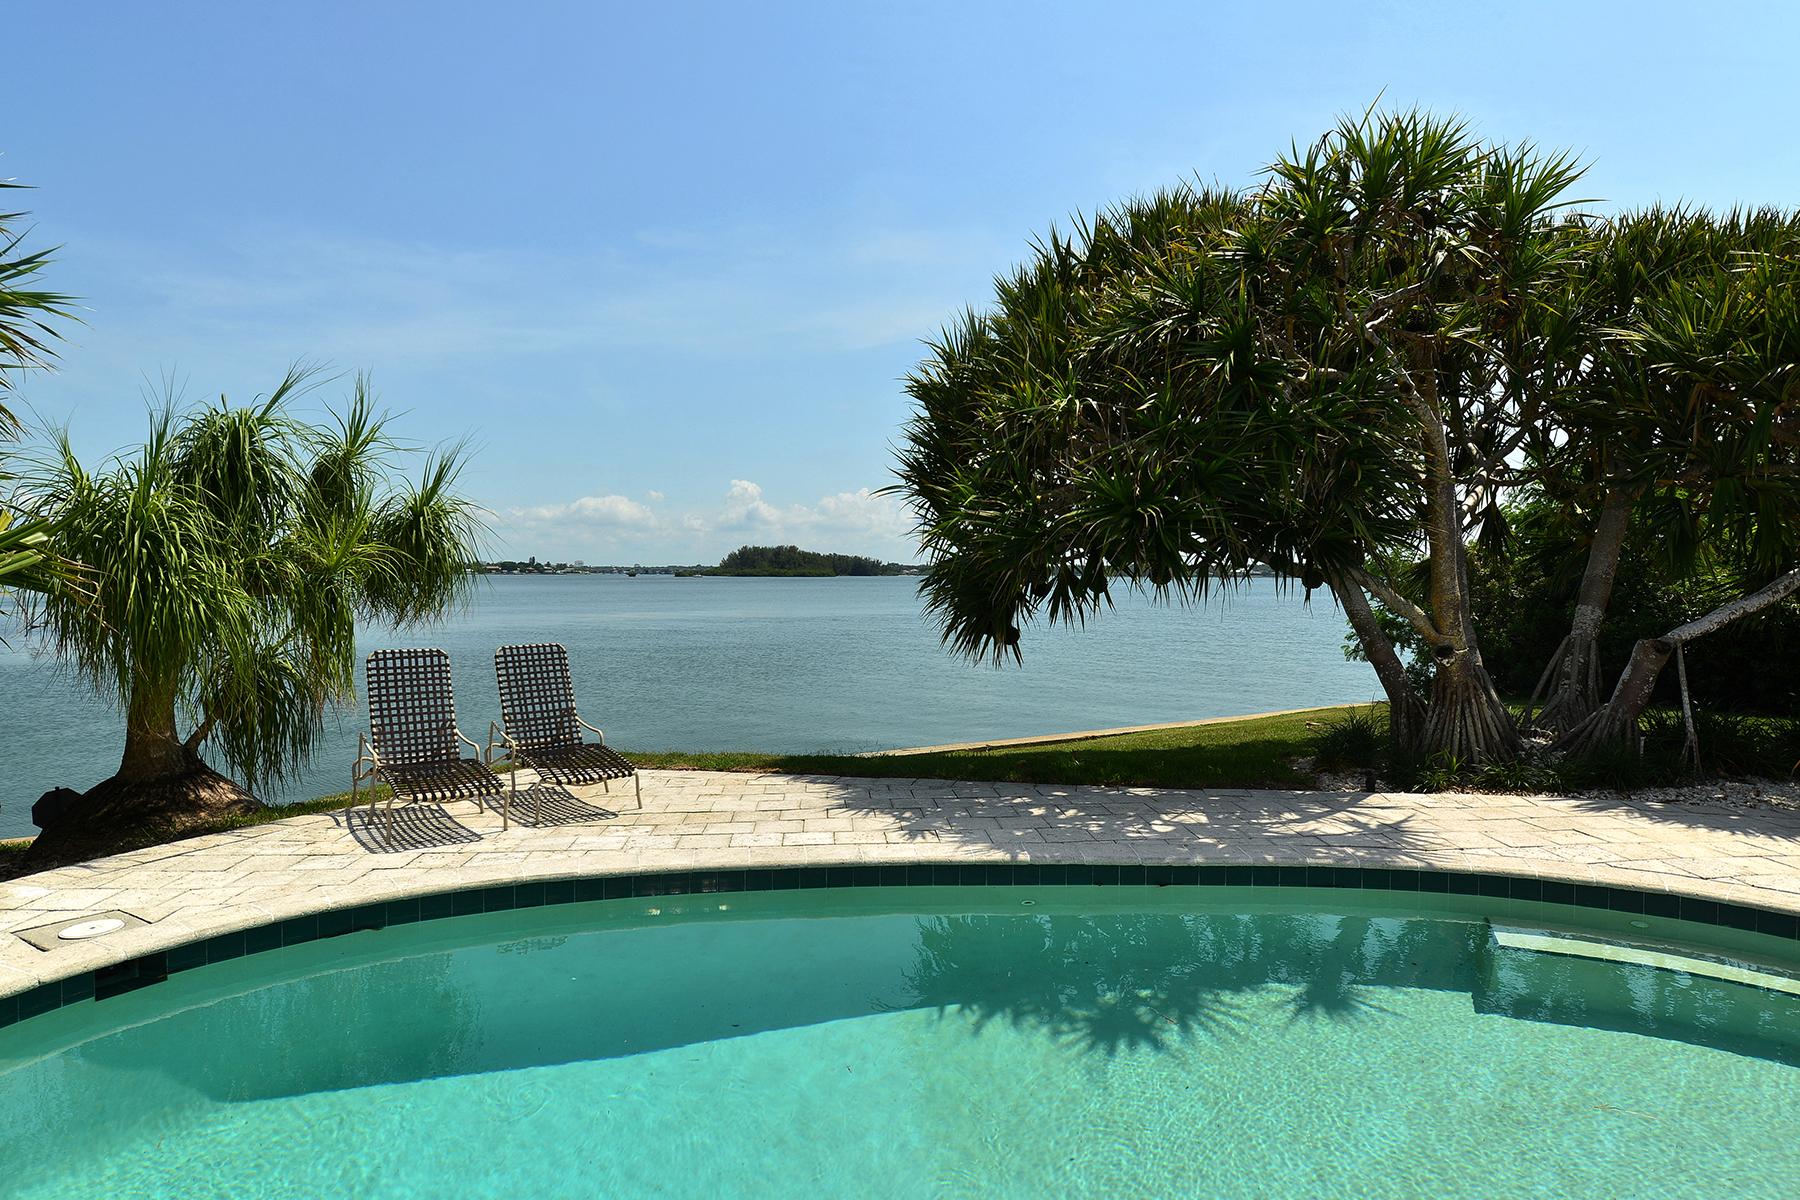 Terreno per Vendita alle ore MANGROVE POINT 842 Mangrove Point Rd 38 Sarasota, Florida 34242 Stati Uniti